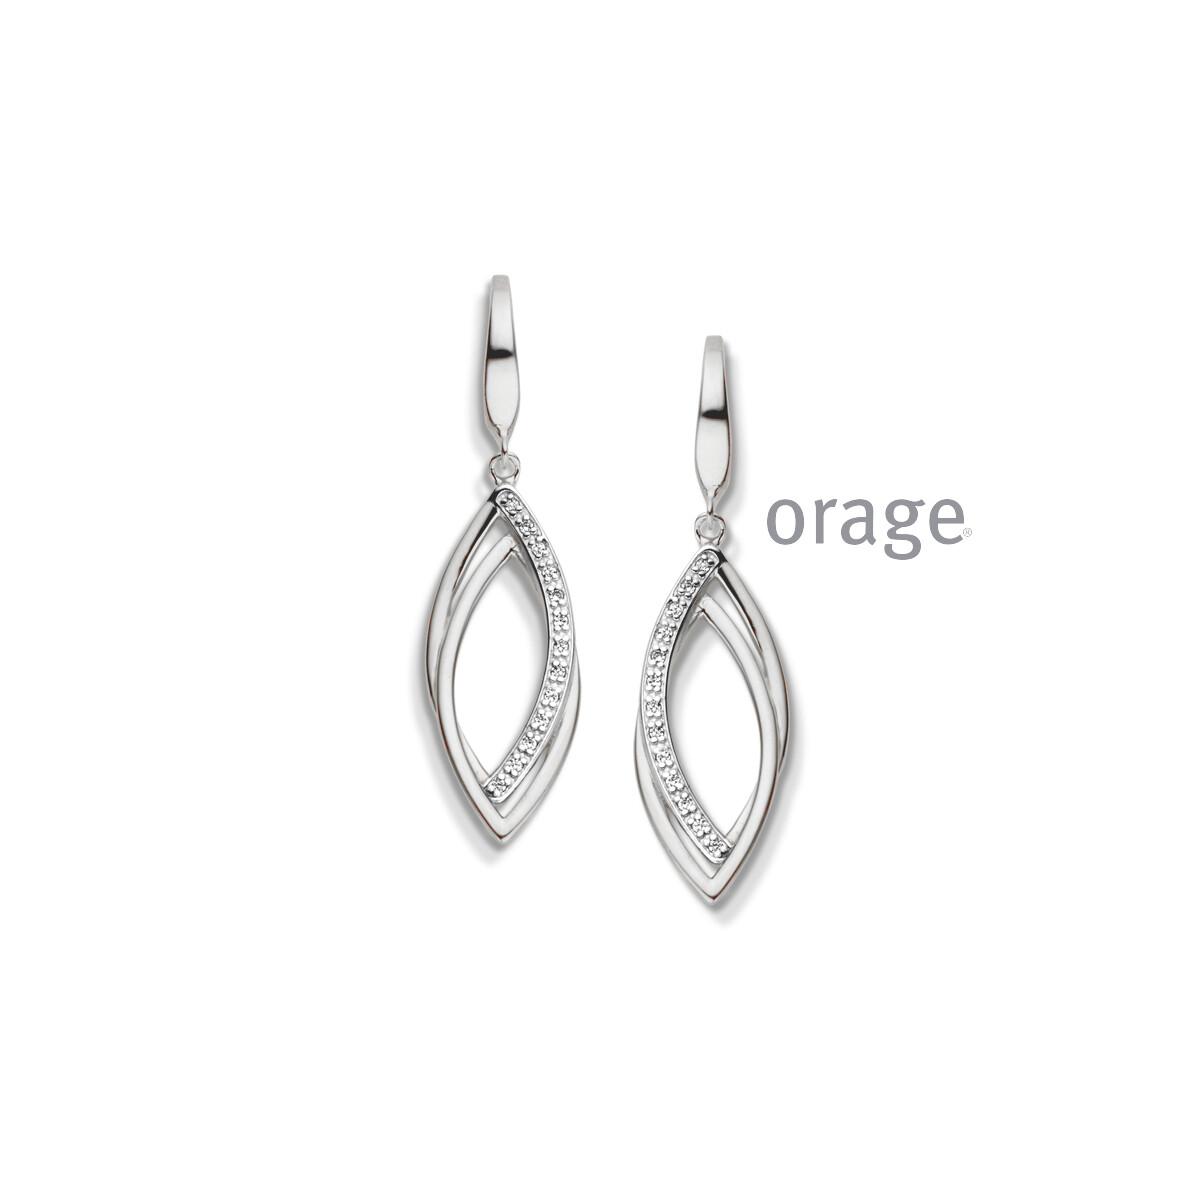 Orage:  AR022-V1322 Oorslingers 925 rh cz (V/14)